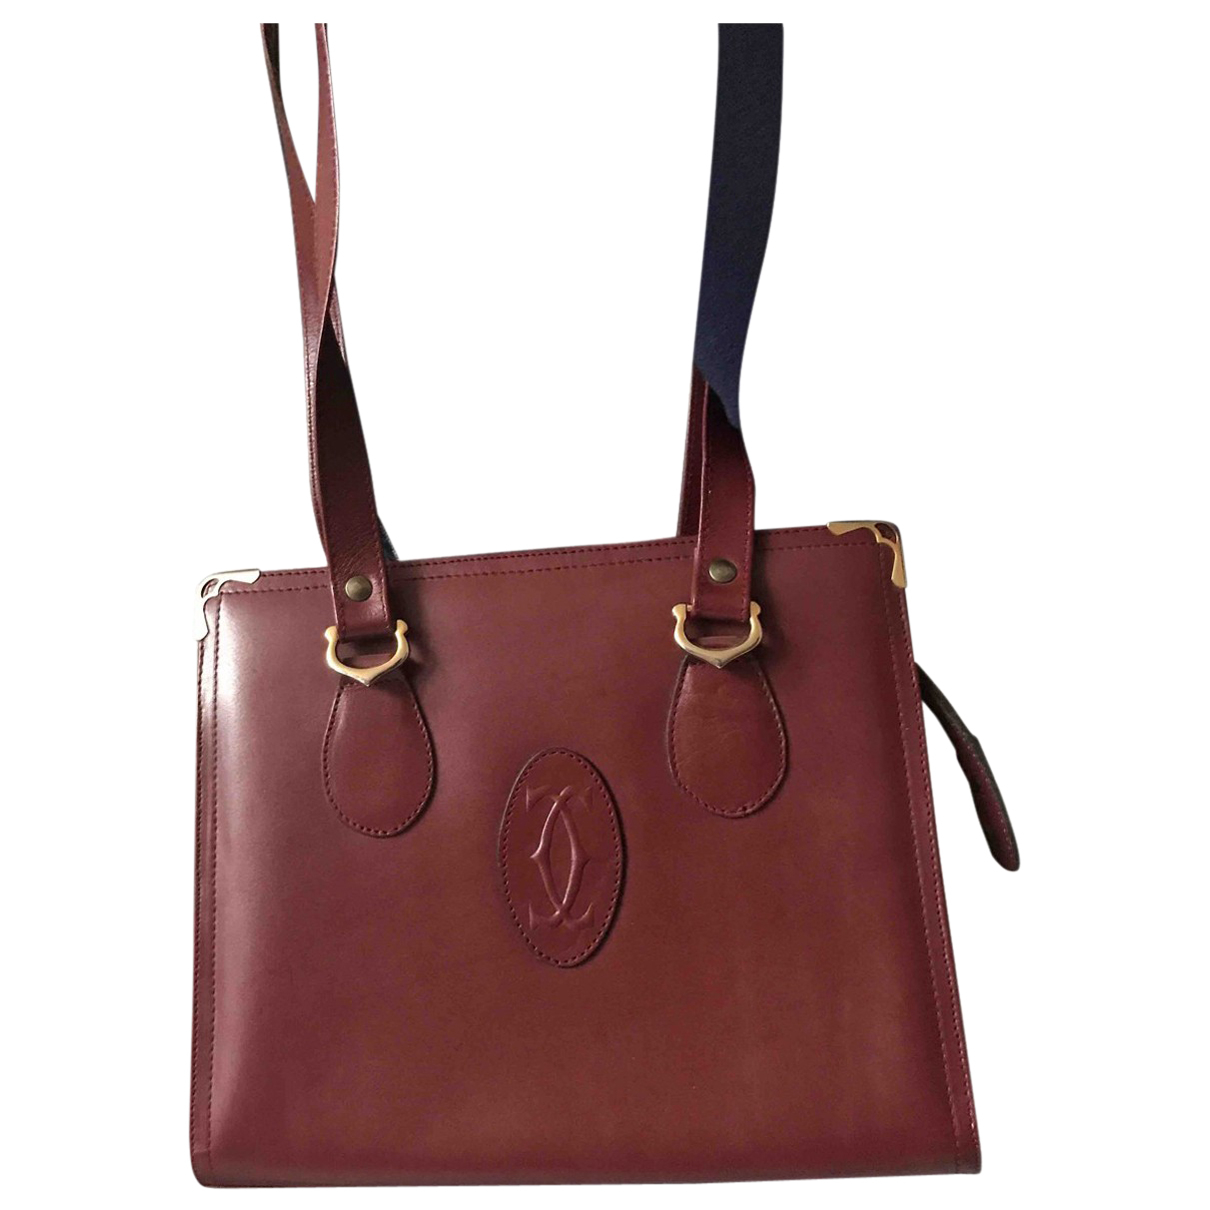 Cartier N Burgundy Leather handbag for Women N